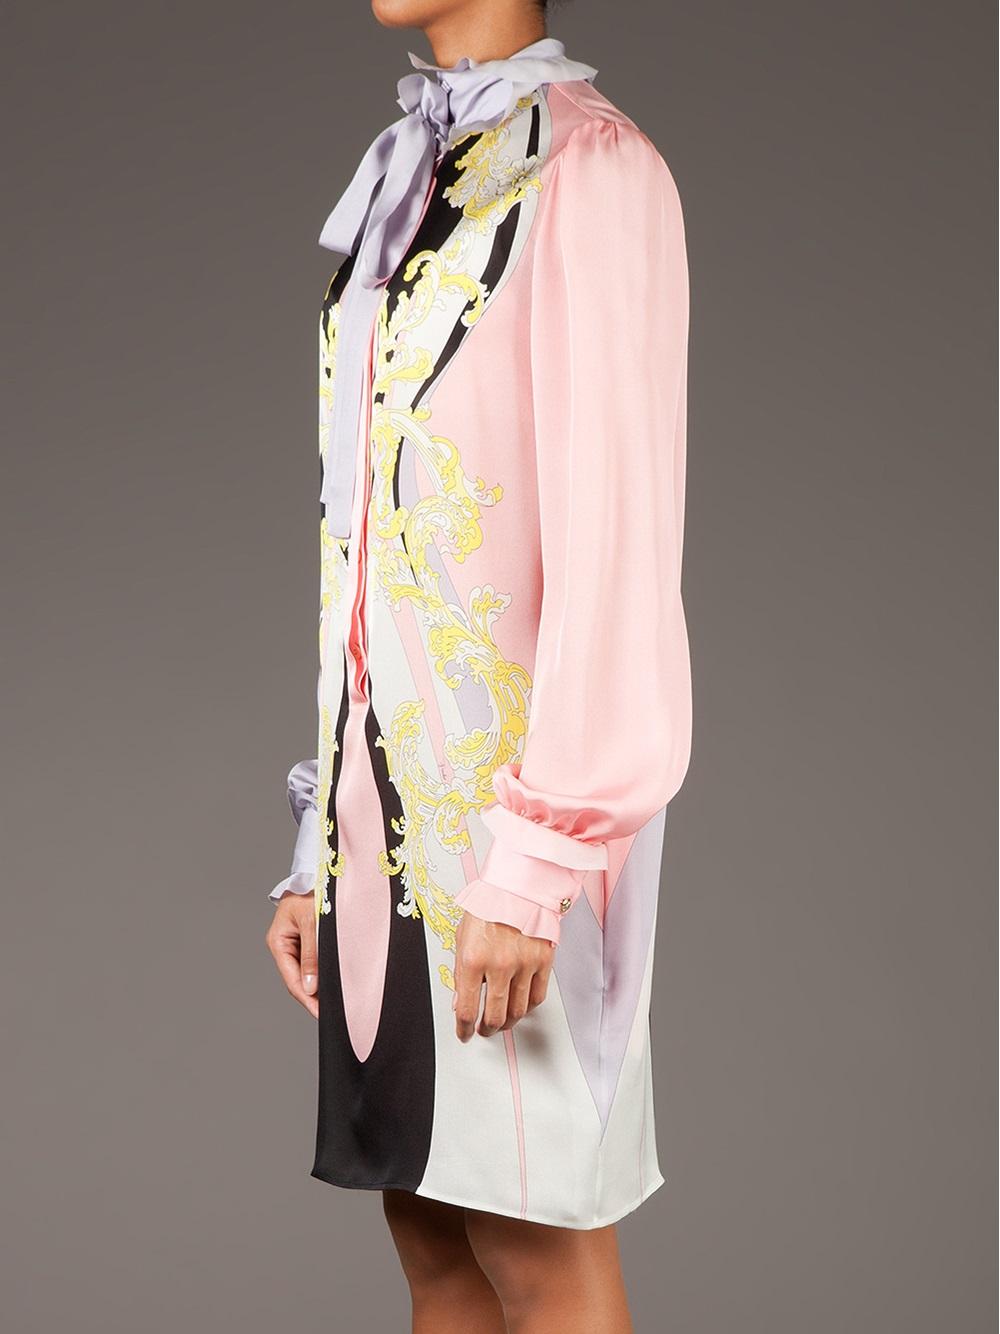 Emilio Pucci Floral Print Ruffle Neck Dress in Pink & Purple (Purple)